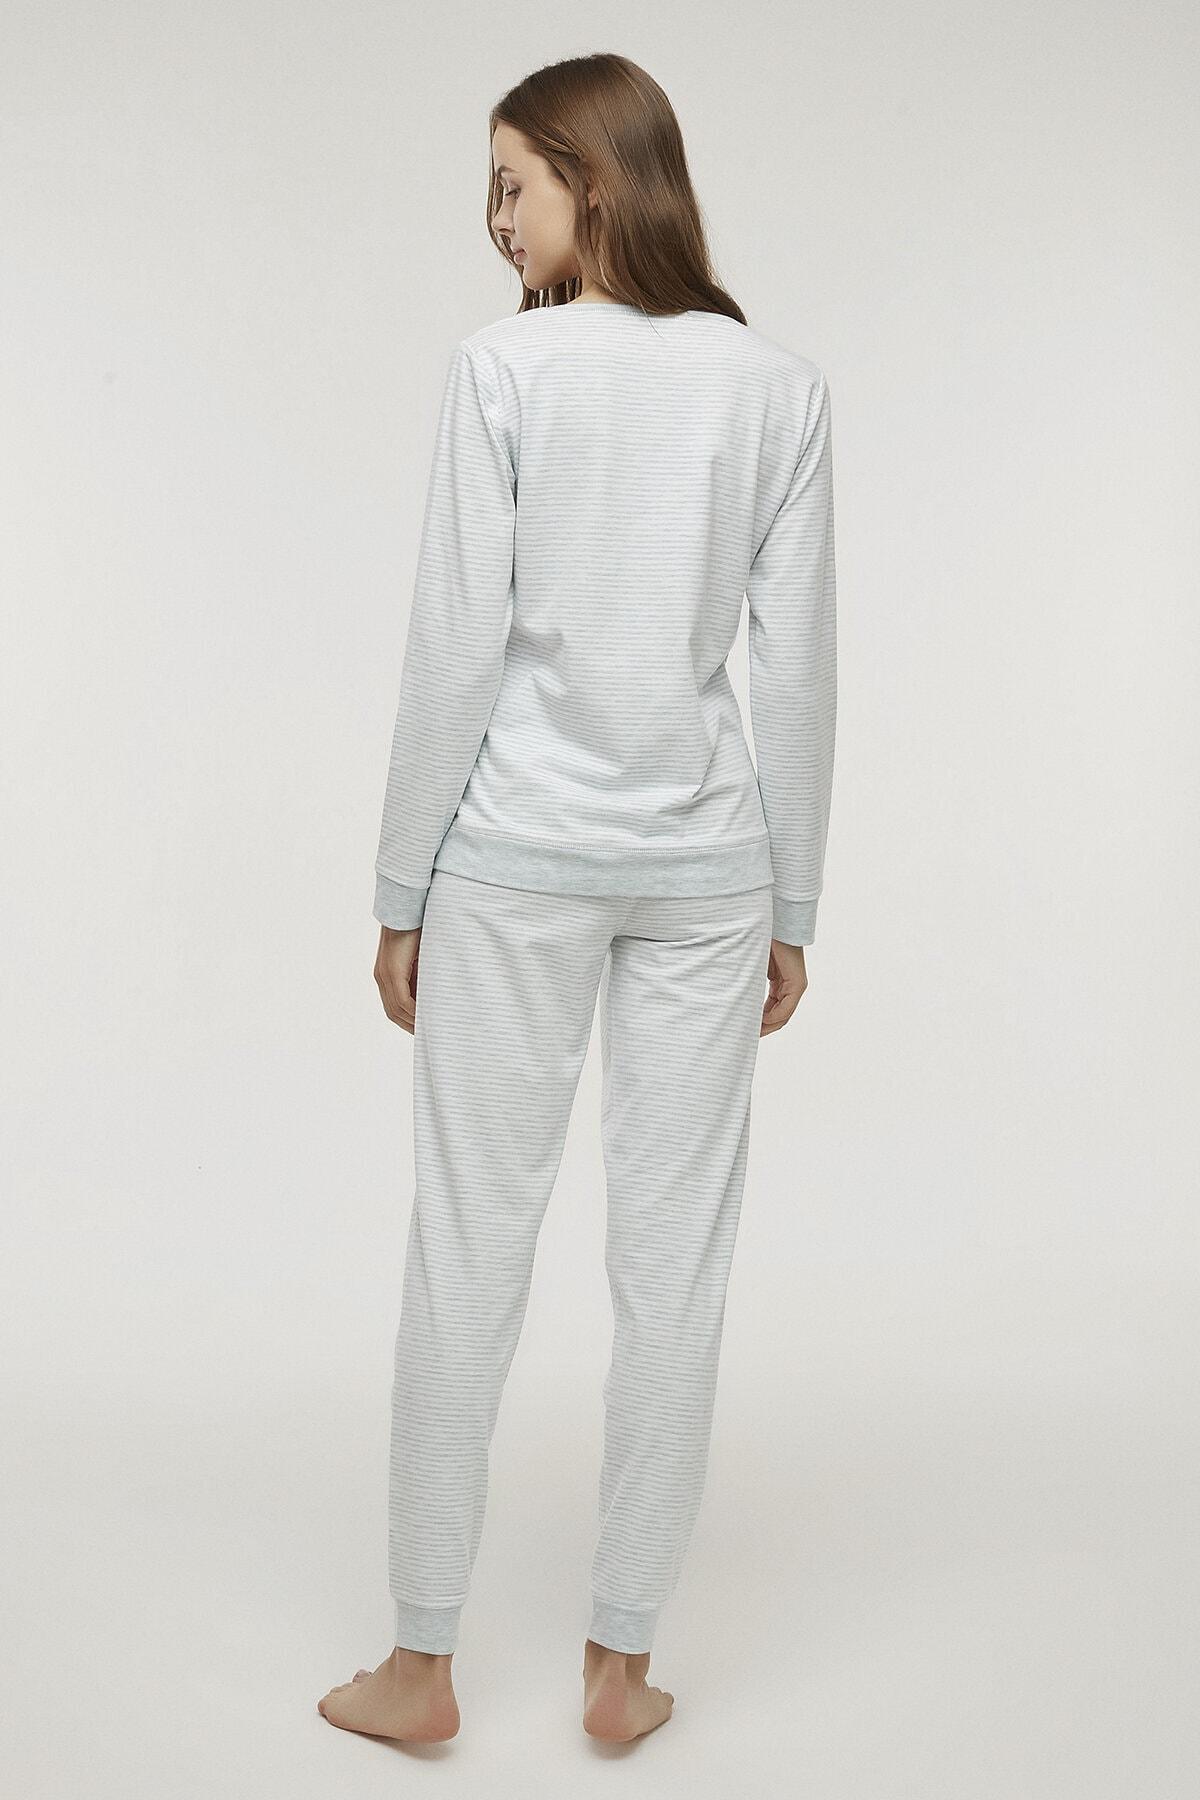 Penti Kadın Stripy Pijama Takımı 3